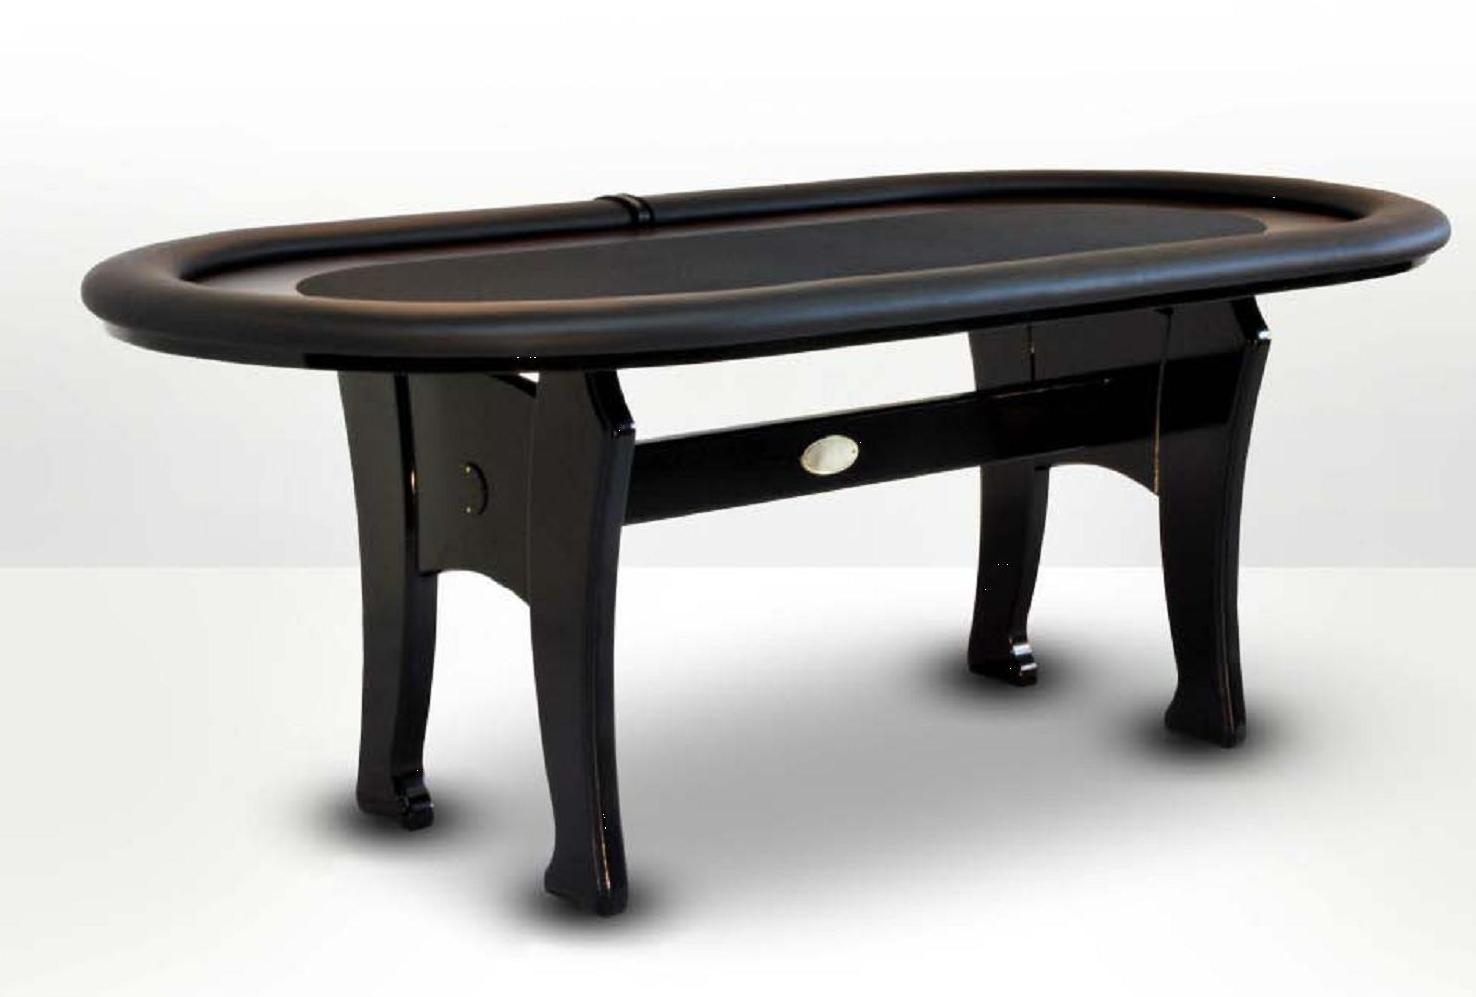 Oval Poker Table black CAIMAN TRADICION - PokerProductos.com